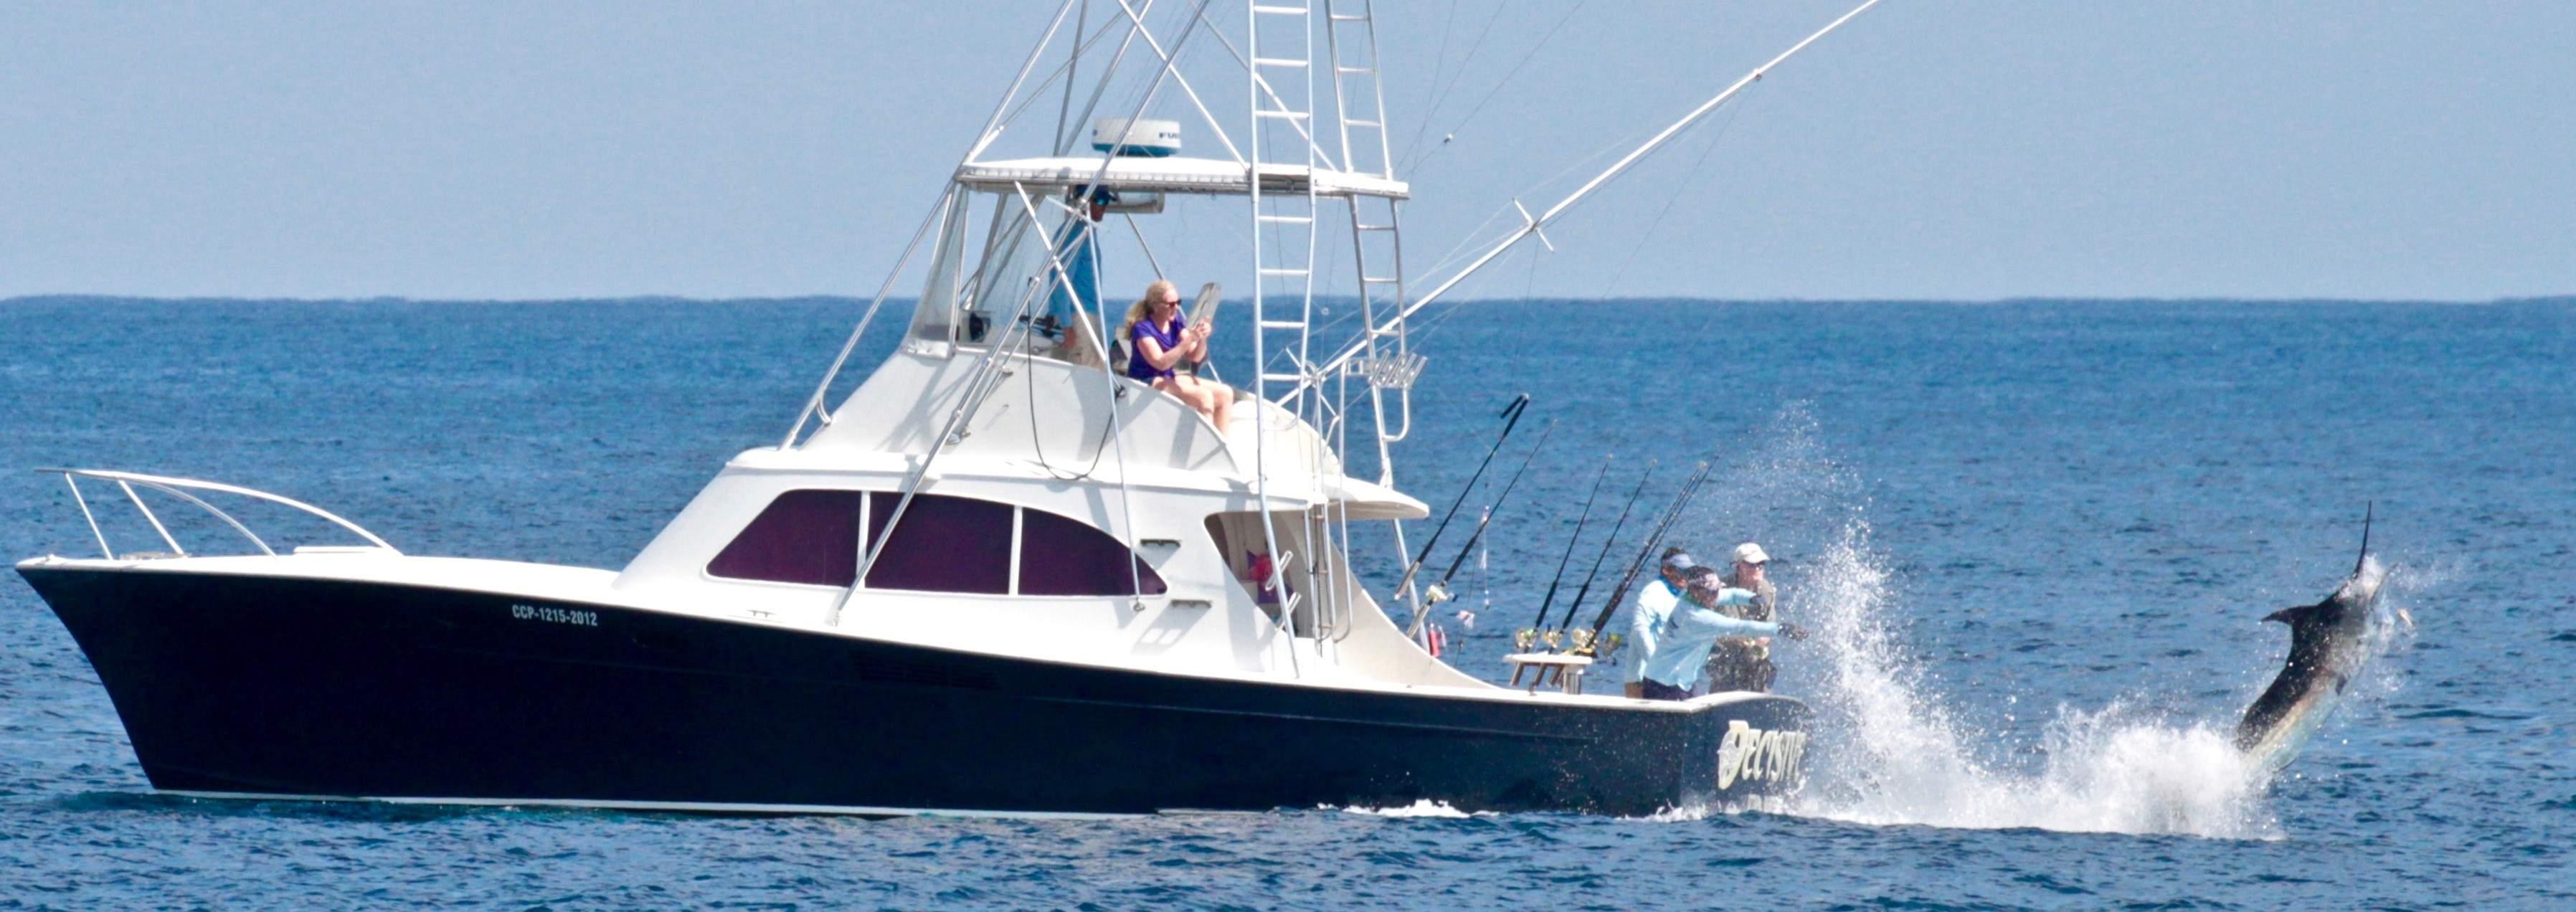 Capt Brad Philips 2016 Record Billfish Releases 1